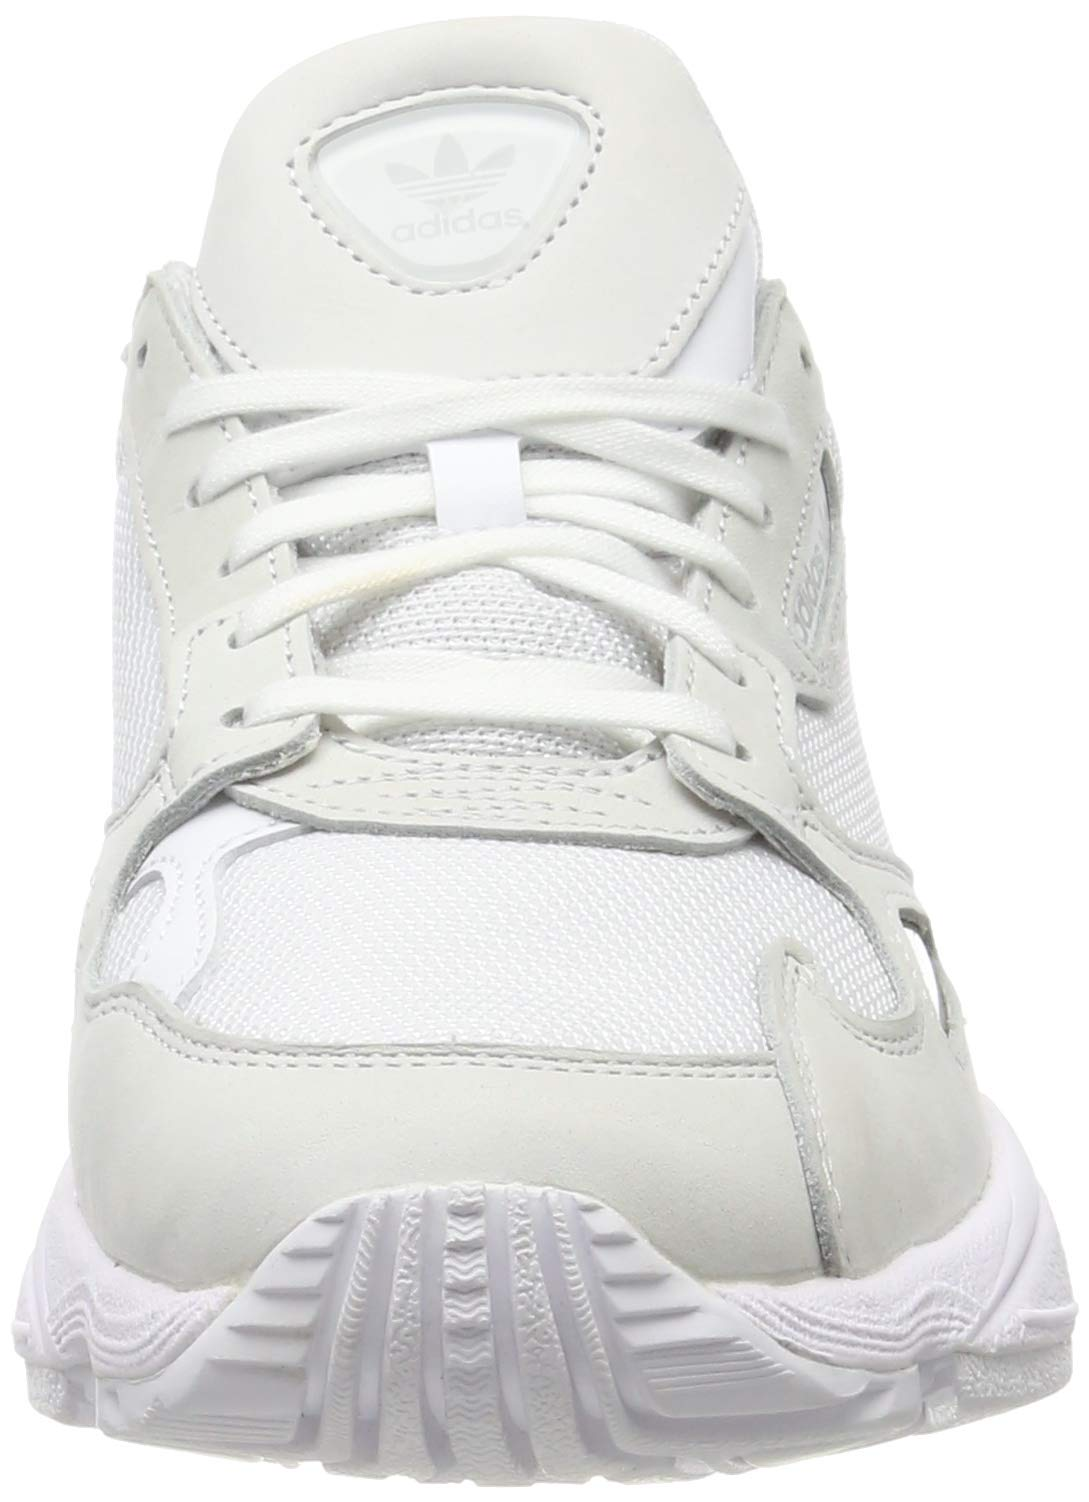 adidas Falcon Sh W, Scarpe da Ginnastica Donna, 0 4 spesavip